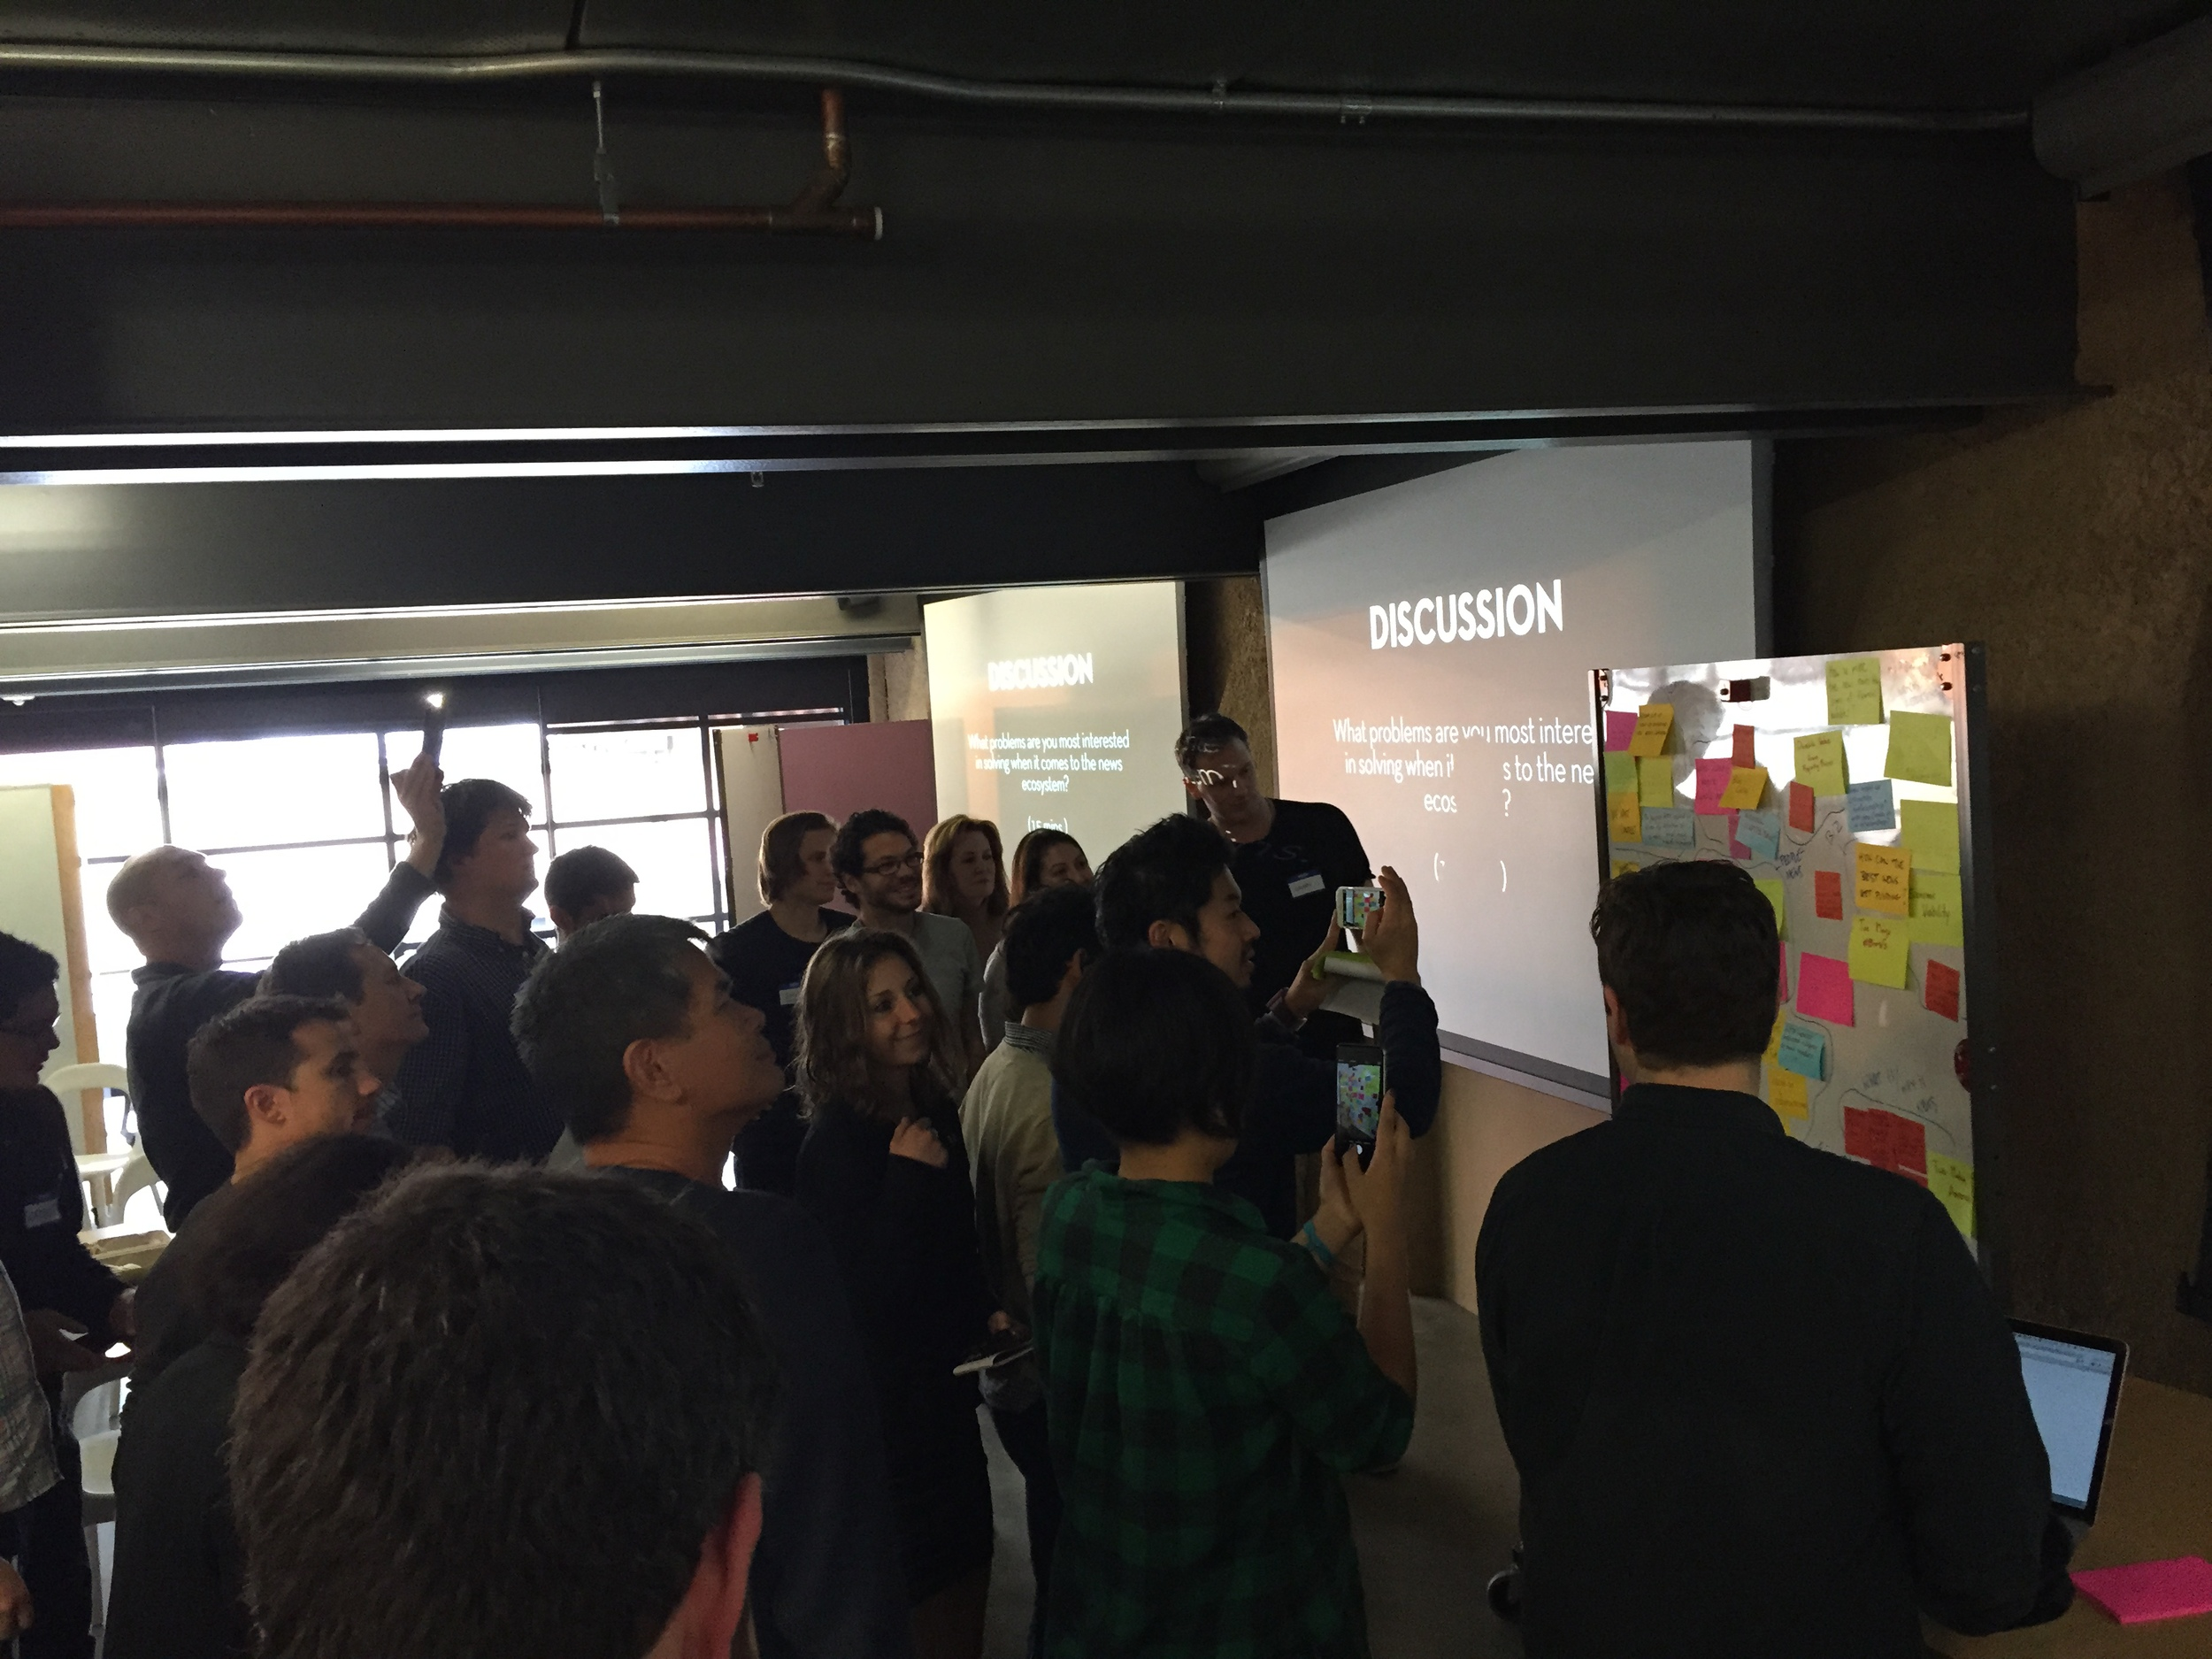 The class gathers around a whiteboard full of ideas ... lots and lots of ideas. (Emi Kolawole)